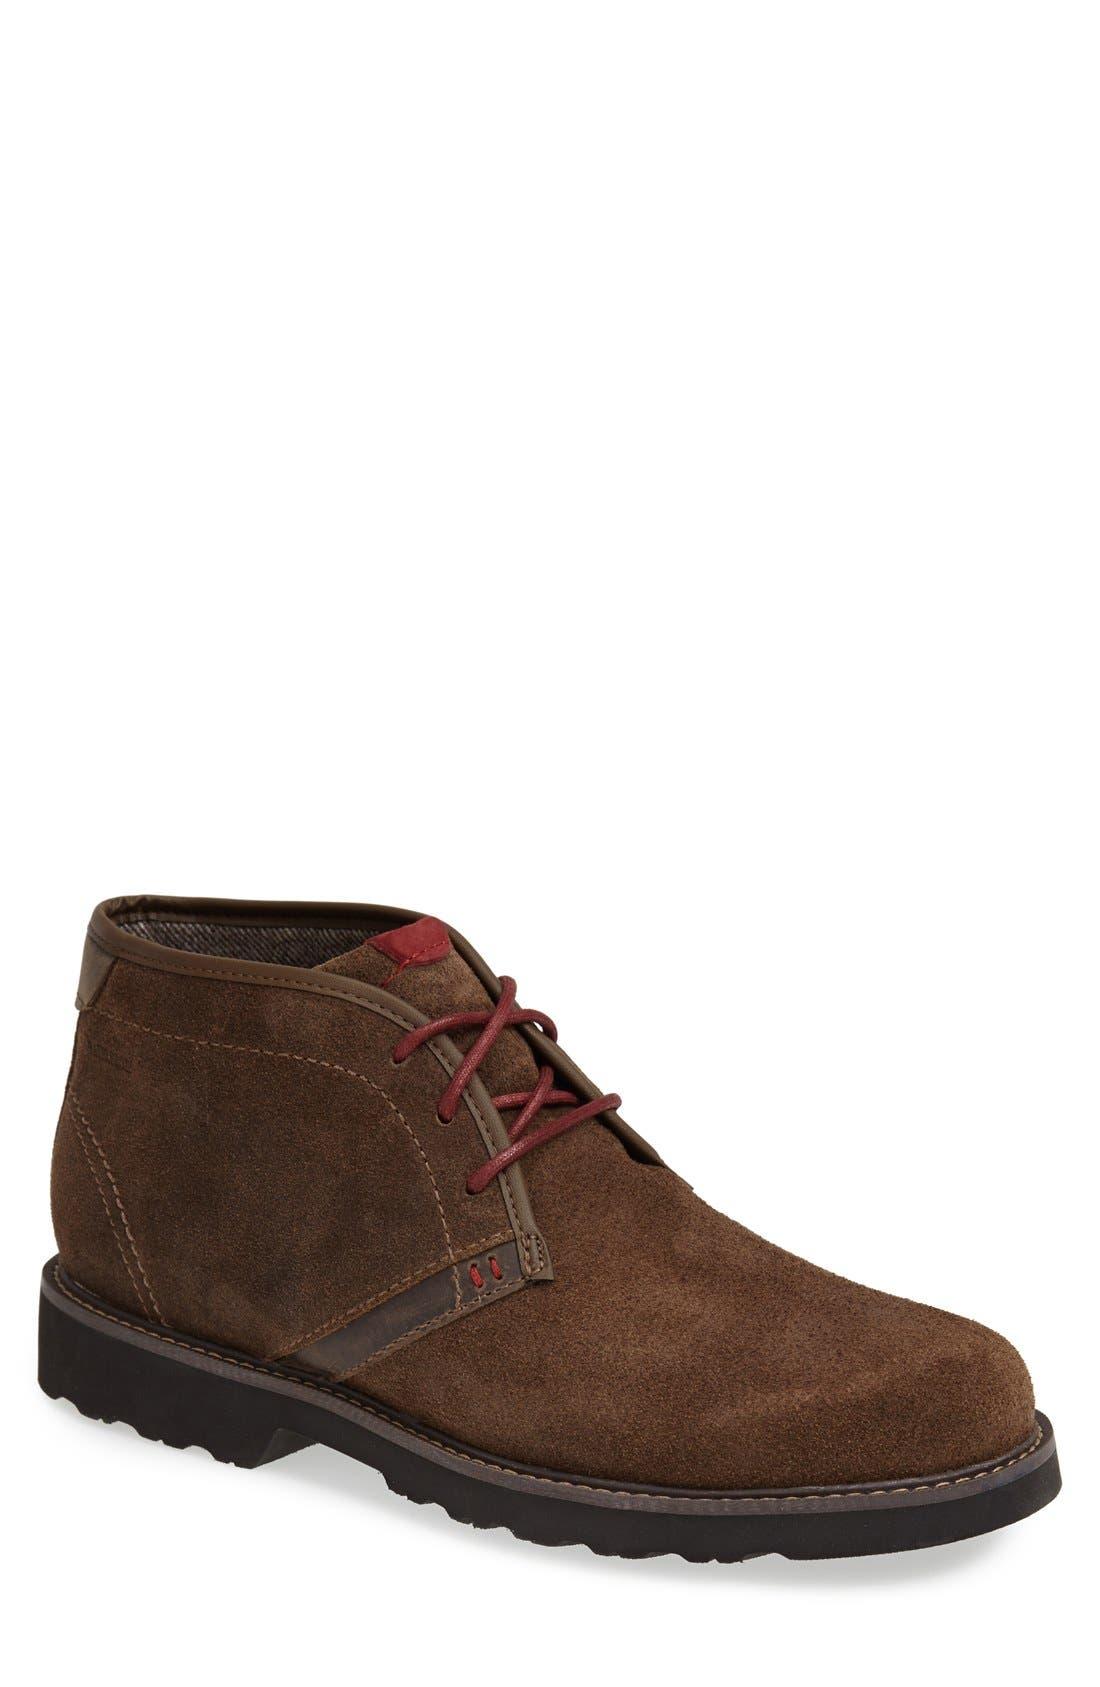 'REVdash' Chukka Boot, Main, color, 202